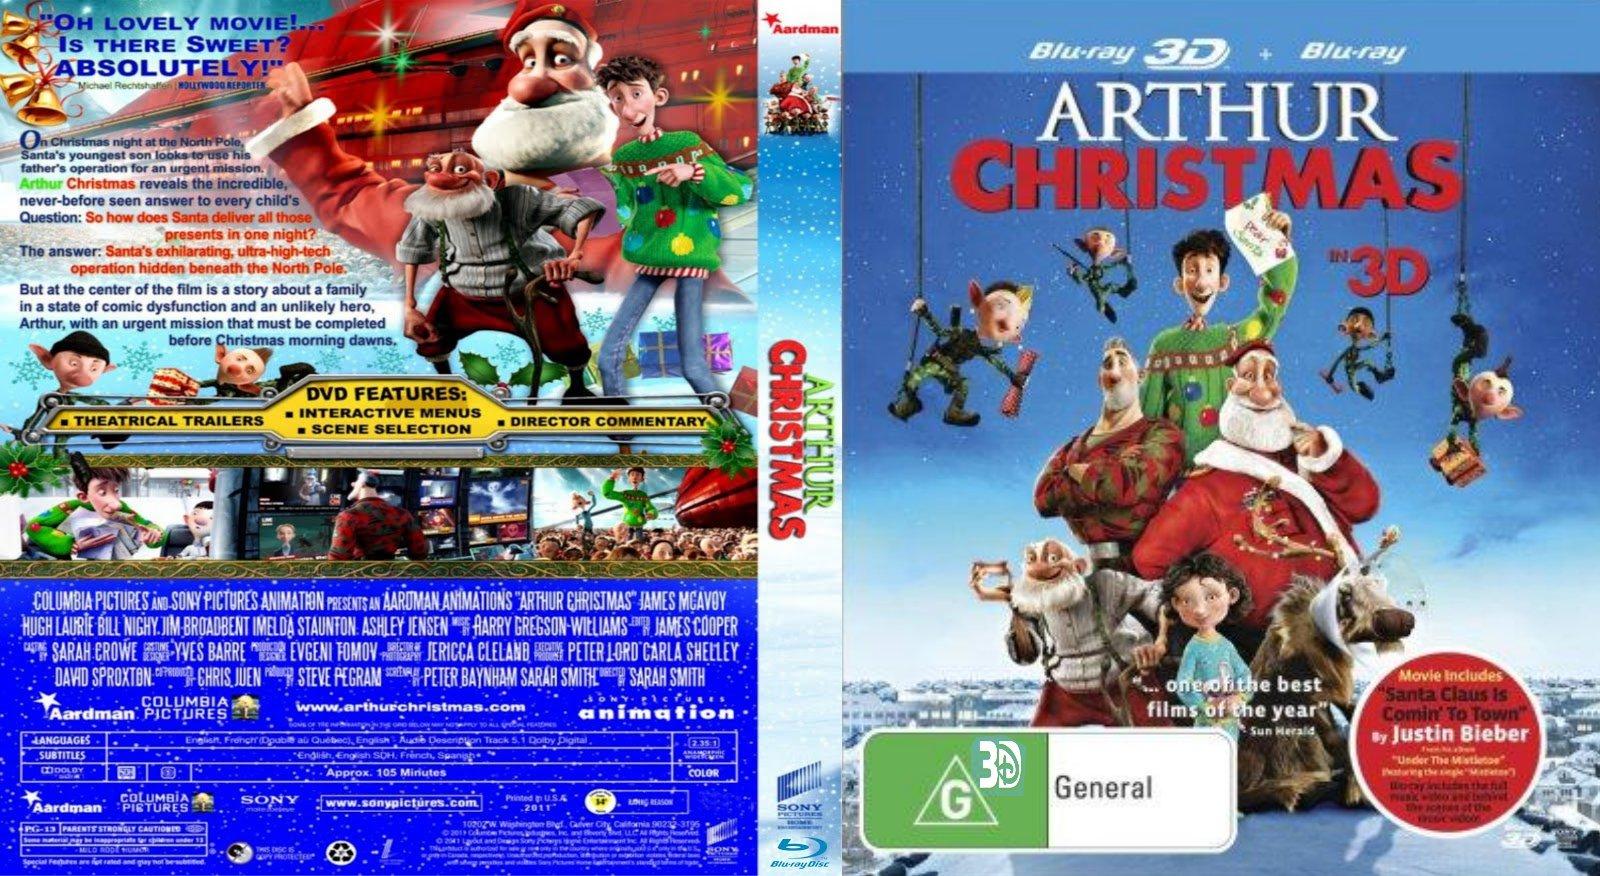 arthur christmas dvd - Arthur Christmas Dvd